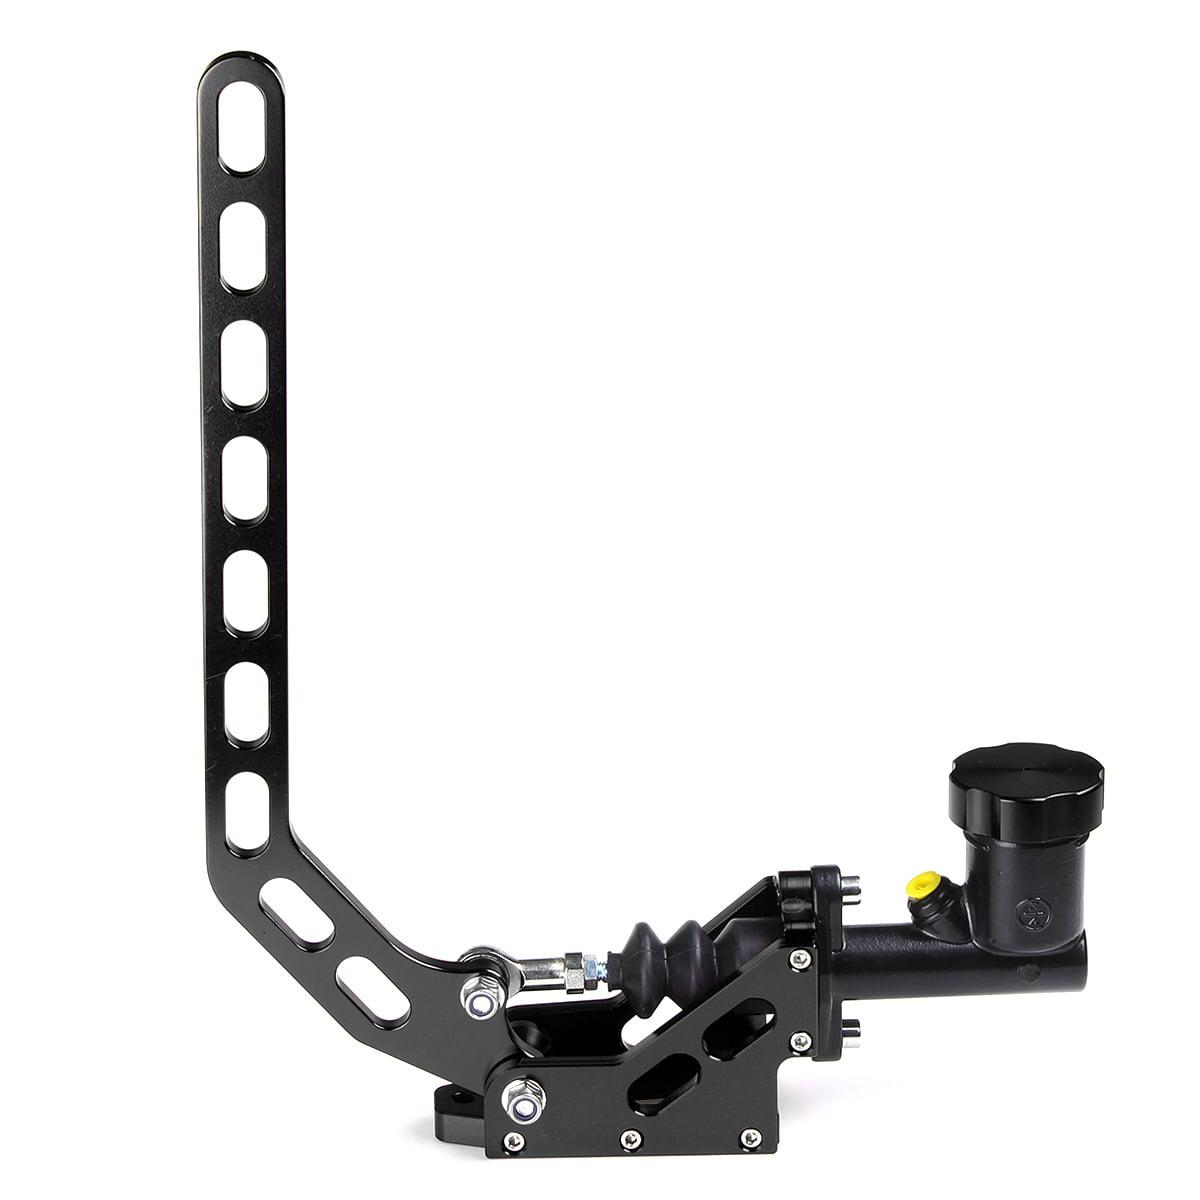 Oil Tank New Black Hydraulic Drift E-Brake Racing Handbrake Lever Gear Locking